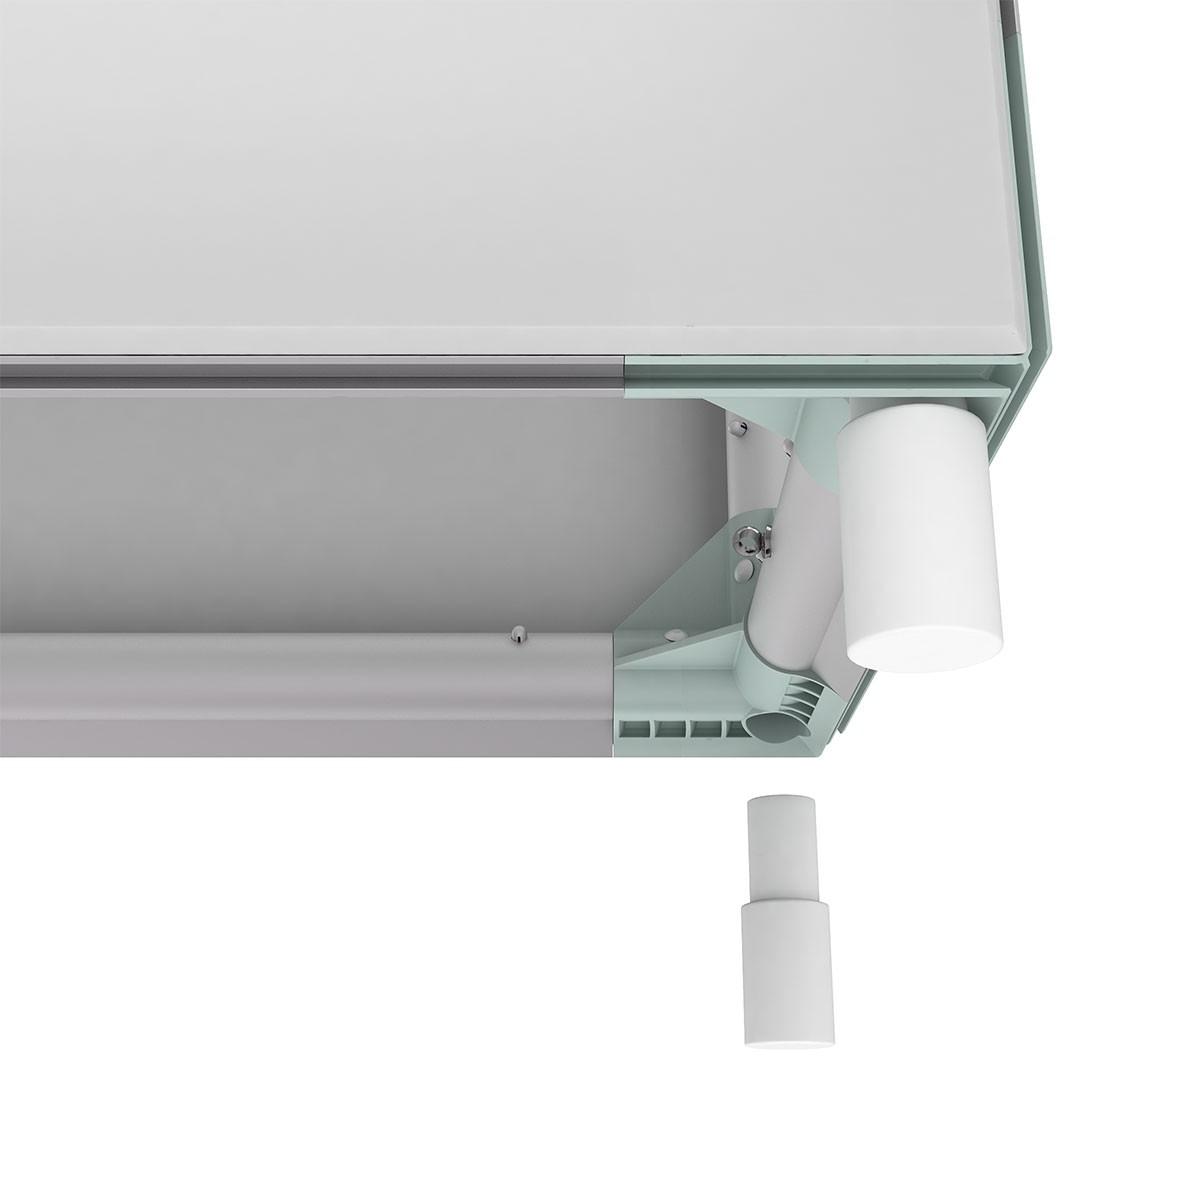 Casonara 50M Backlit Counter